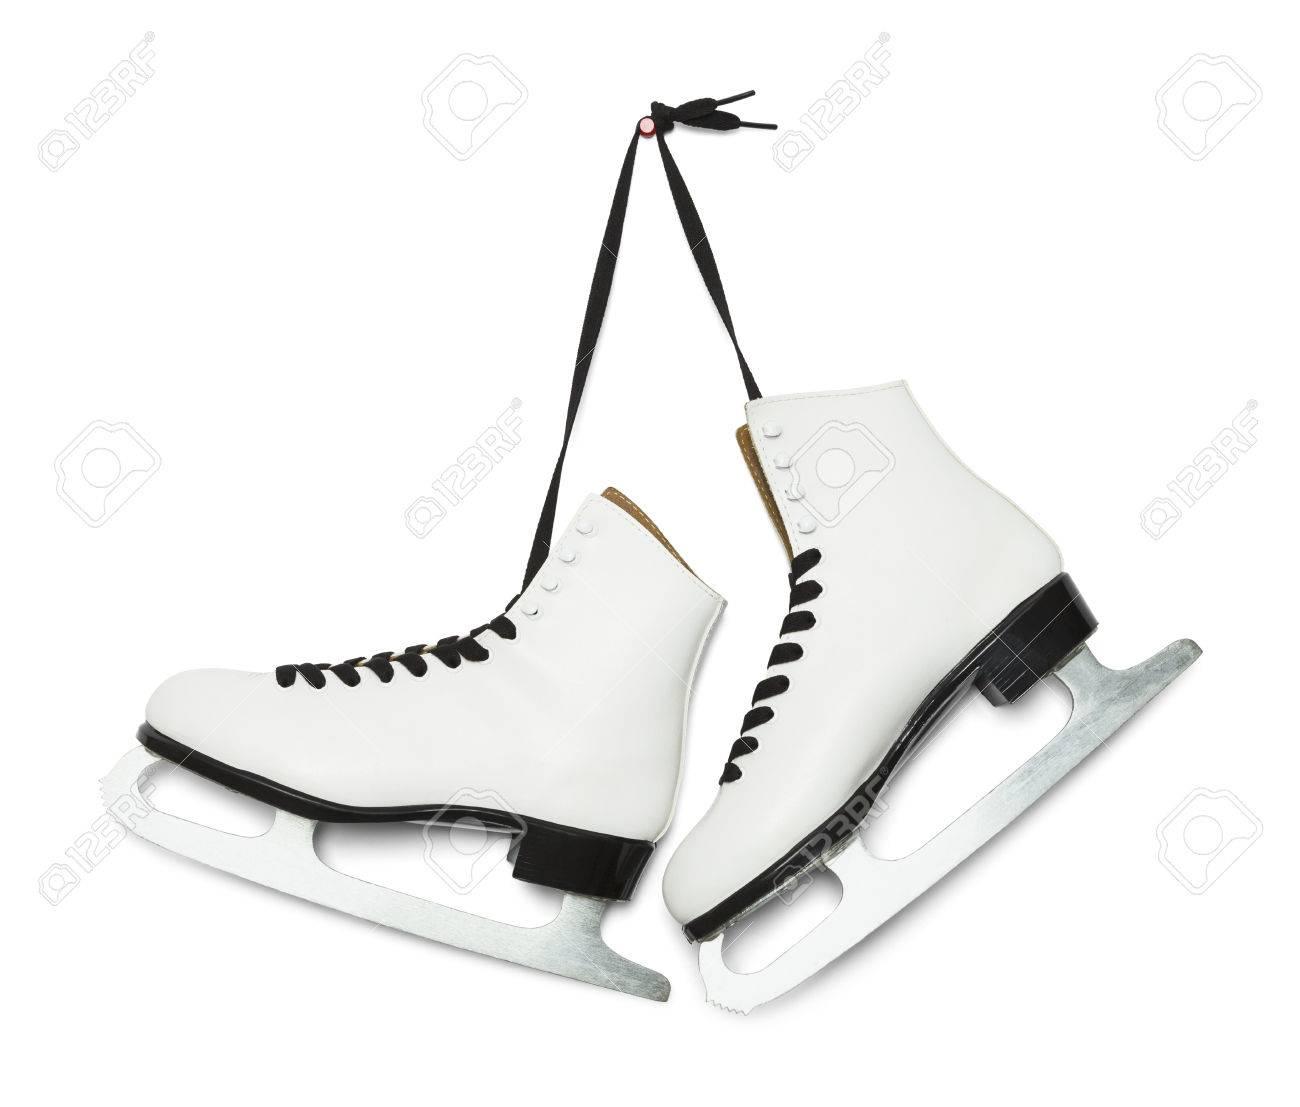 Pair of Figure Ice Skates Hanging Isolated on White Background..